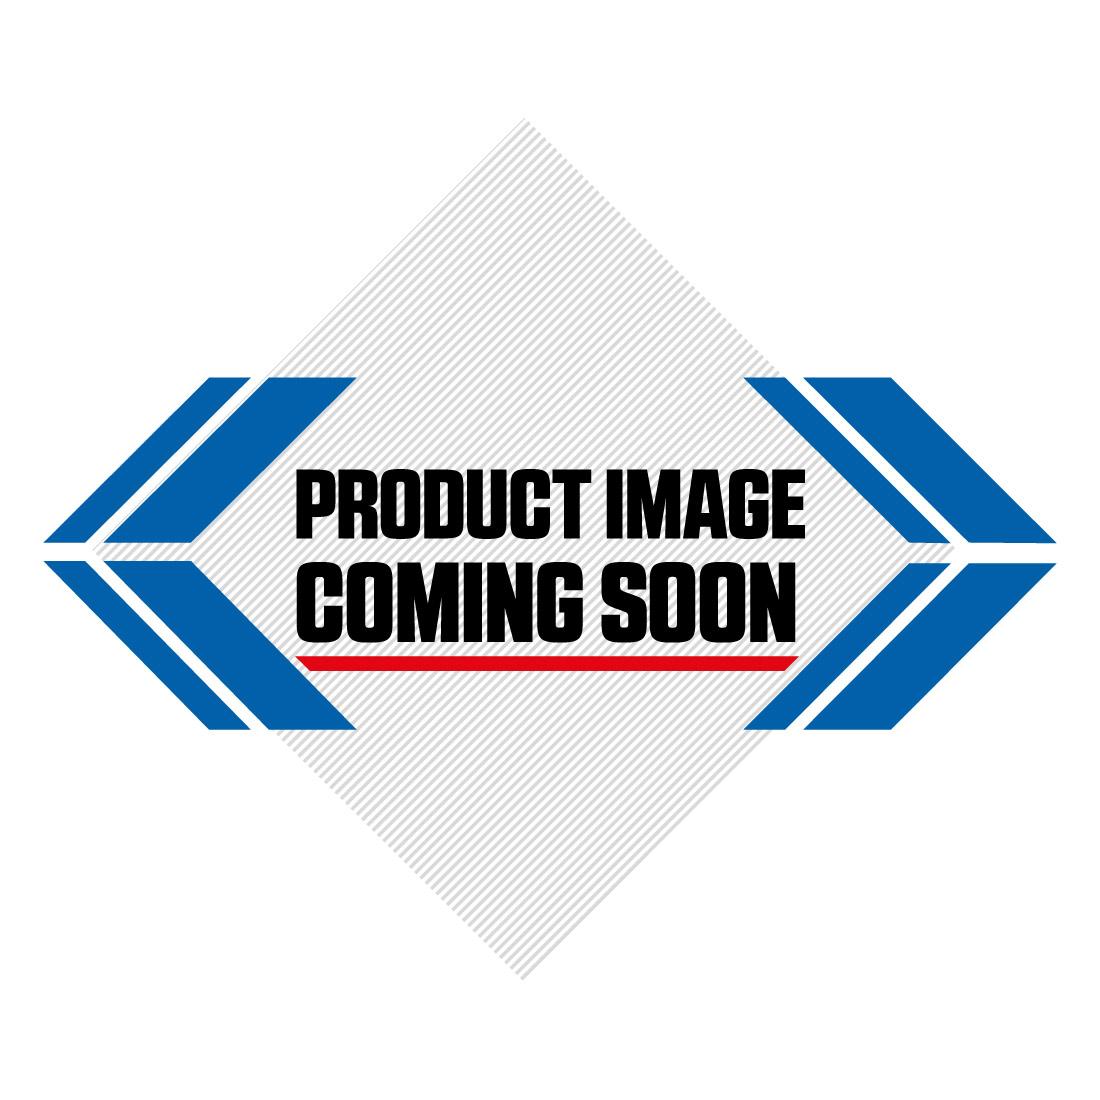 Suzuki Plastic Kit RMZ 250 (10-18) Black Image-4>